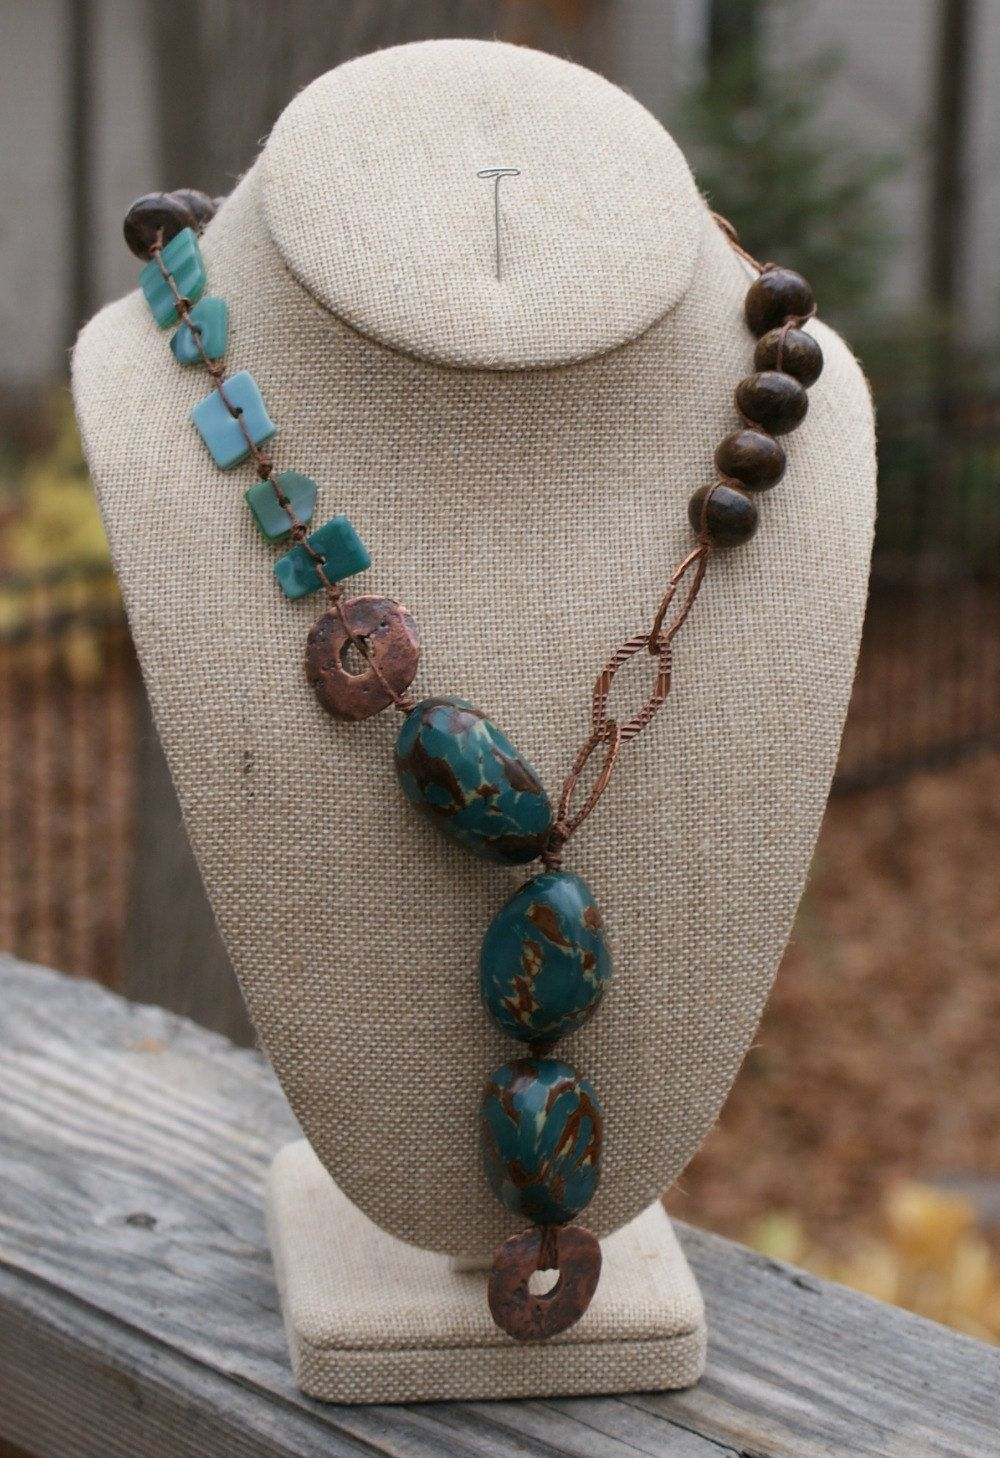 Teal Tagua Nut Necklace - Greek Mykonos - Beach Glass - Earthy Bohemian Jewelry by YaY Jewelry. $80.00, via Etsy.